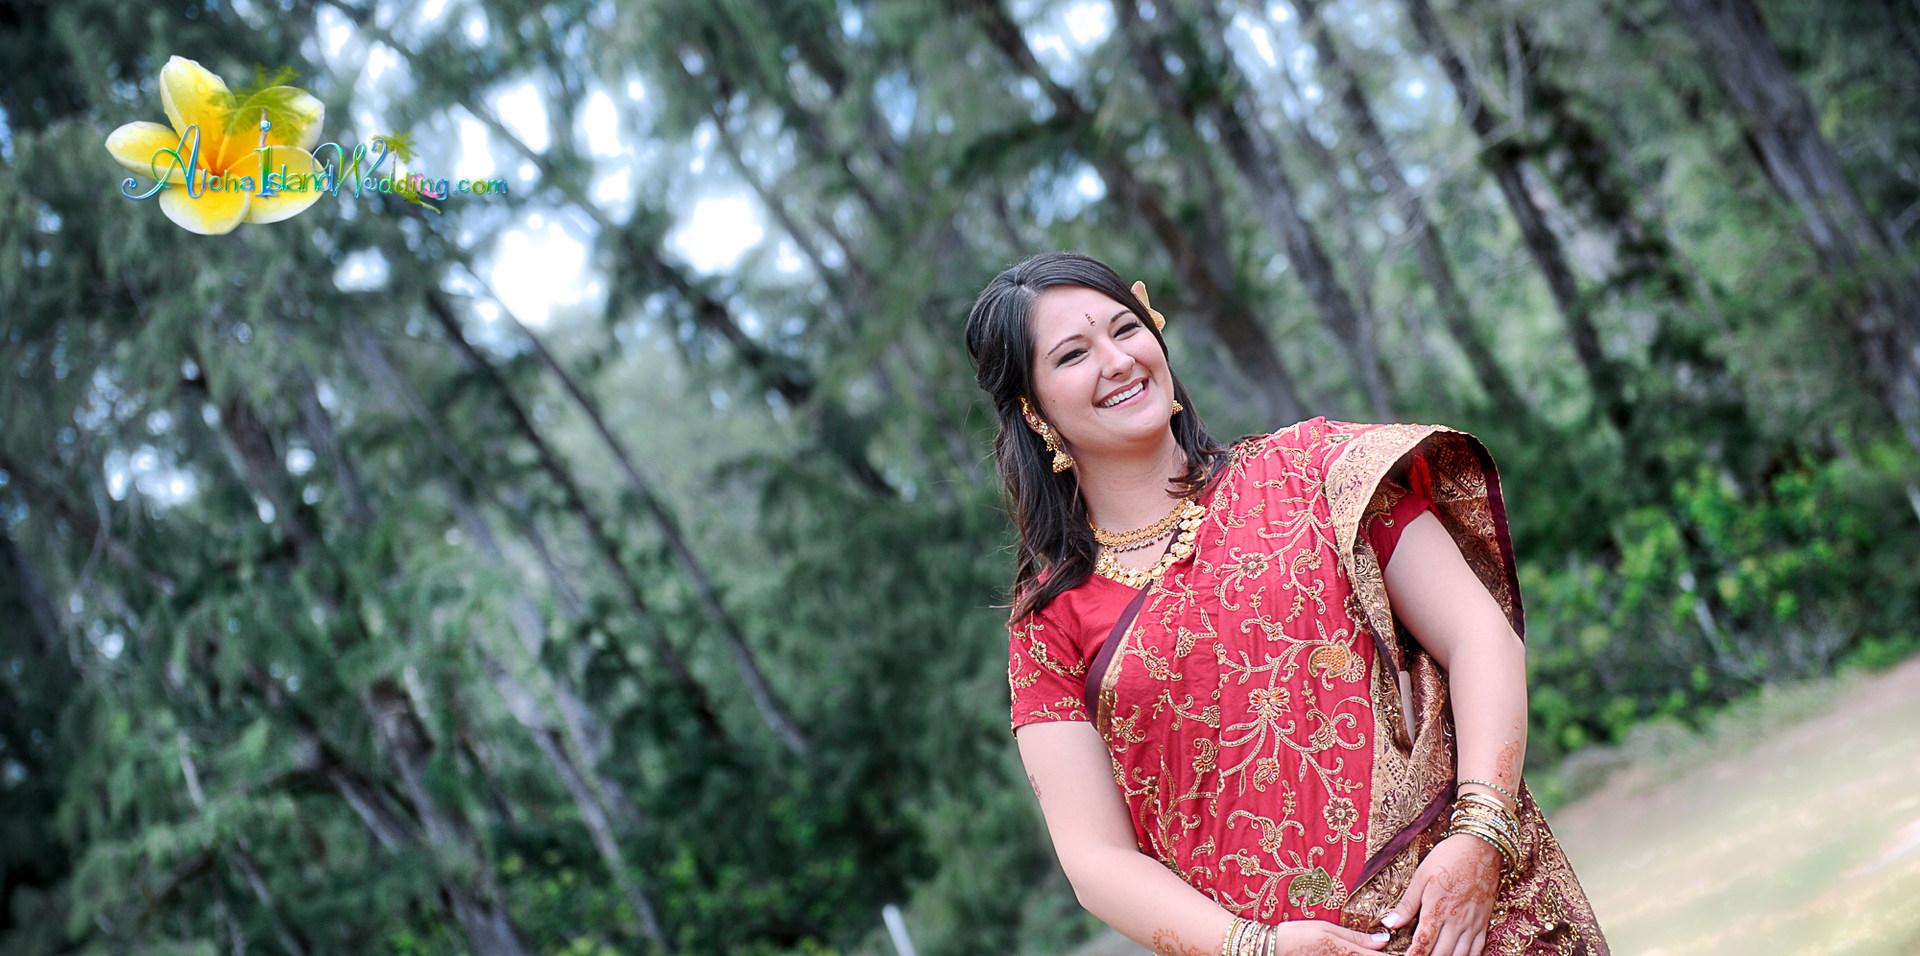 Indian wedding ceremony in hawaii-4.jpg